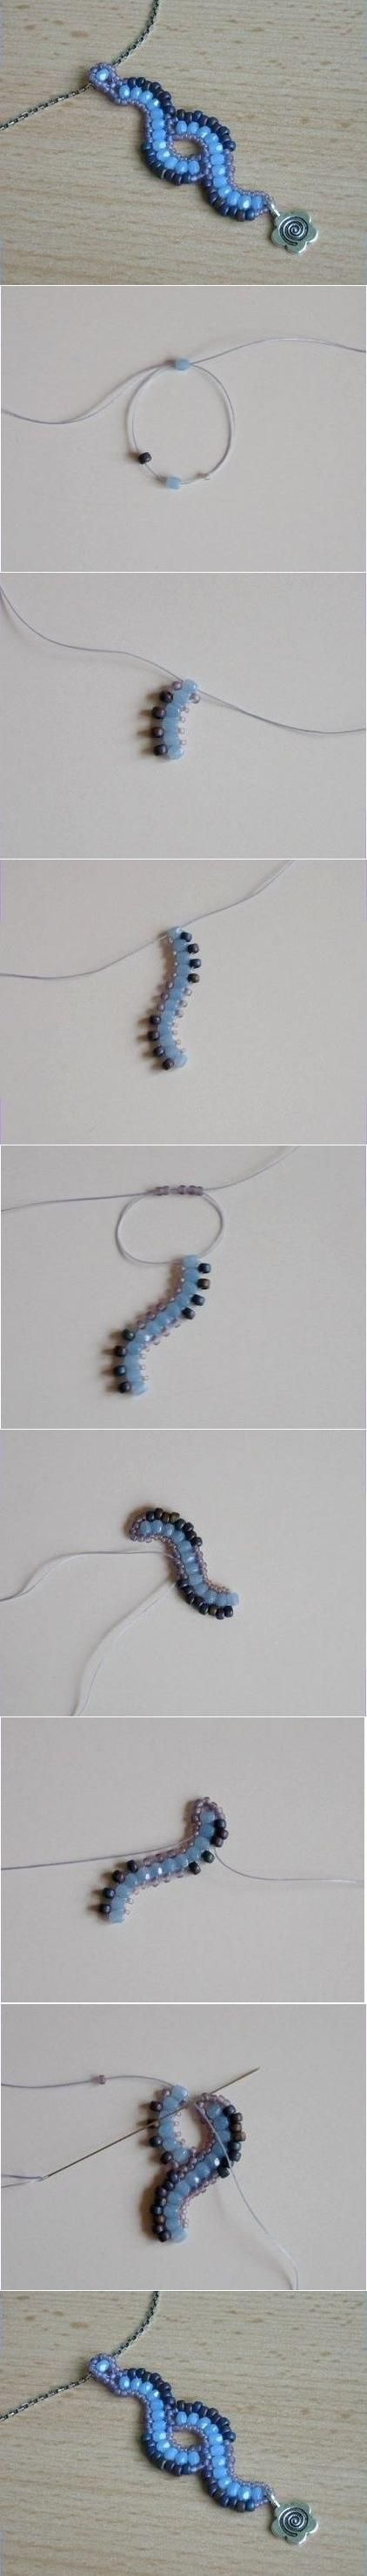 DIY Nice Bead Pendant DIY Projects / UsefulDIY.com